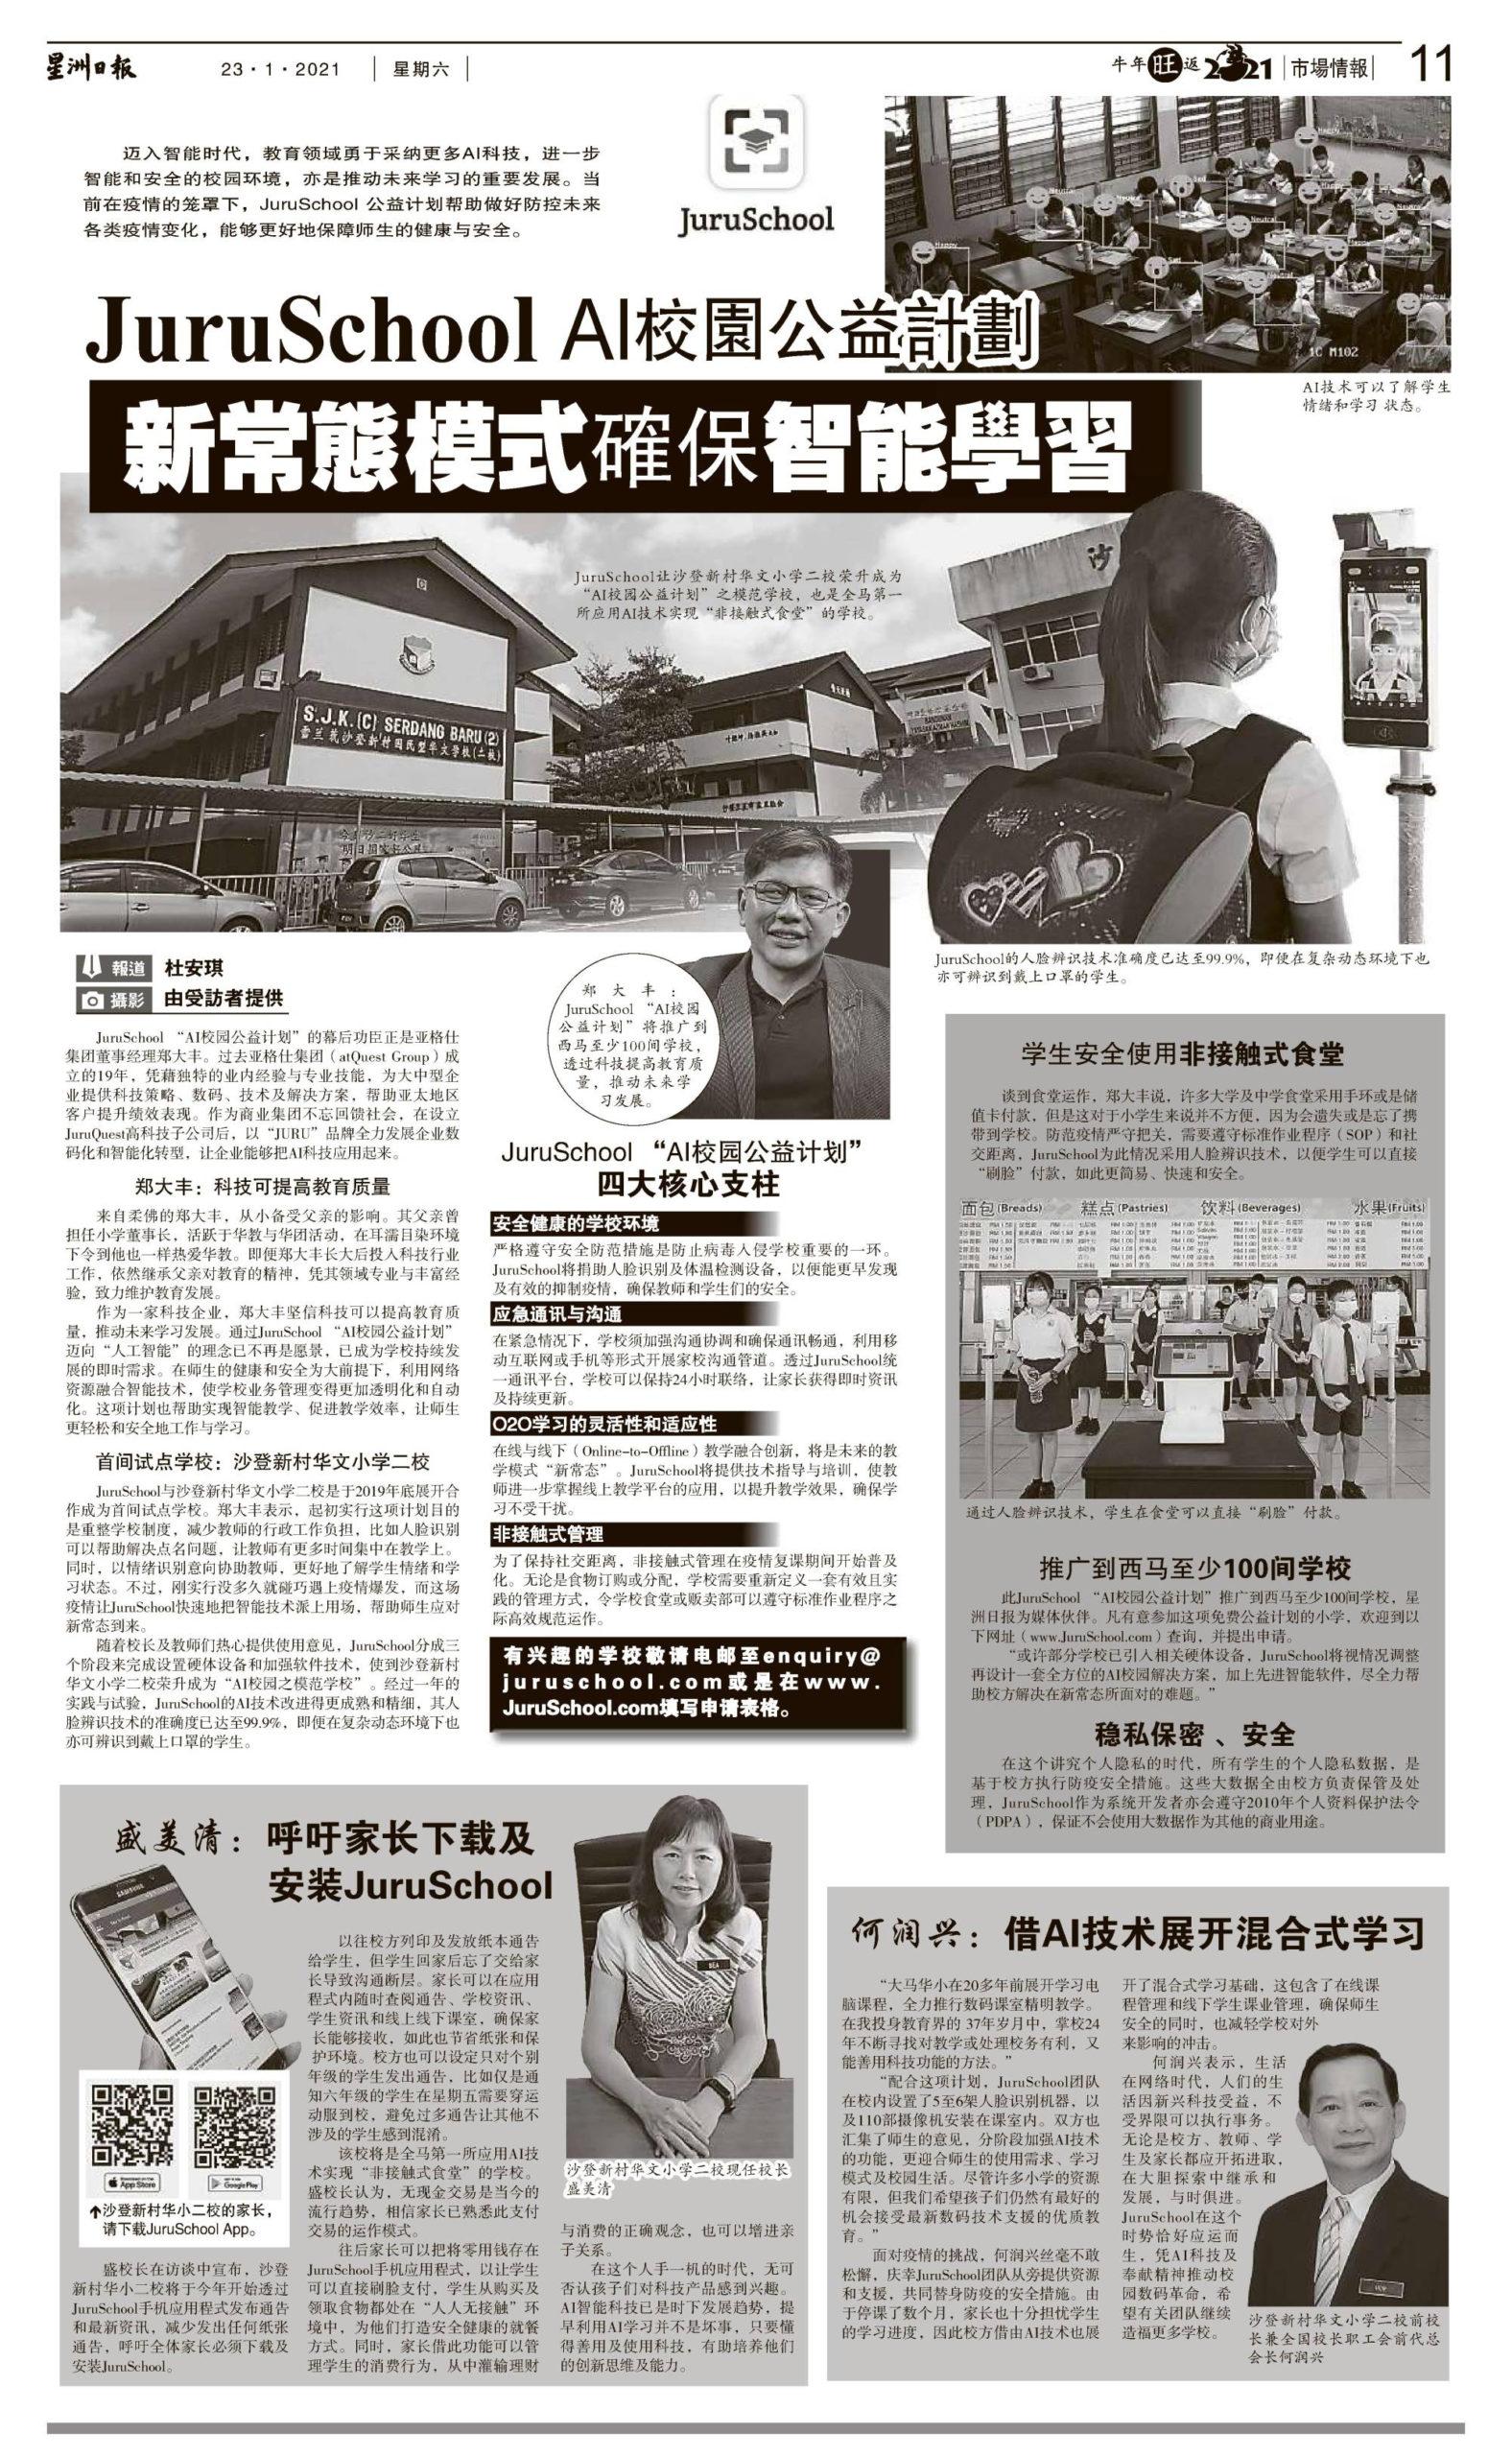 JuruSchool News